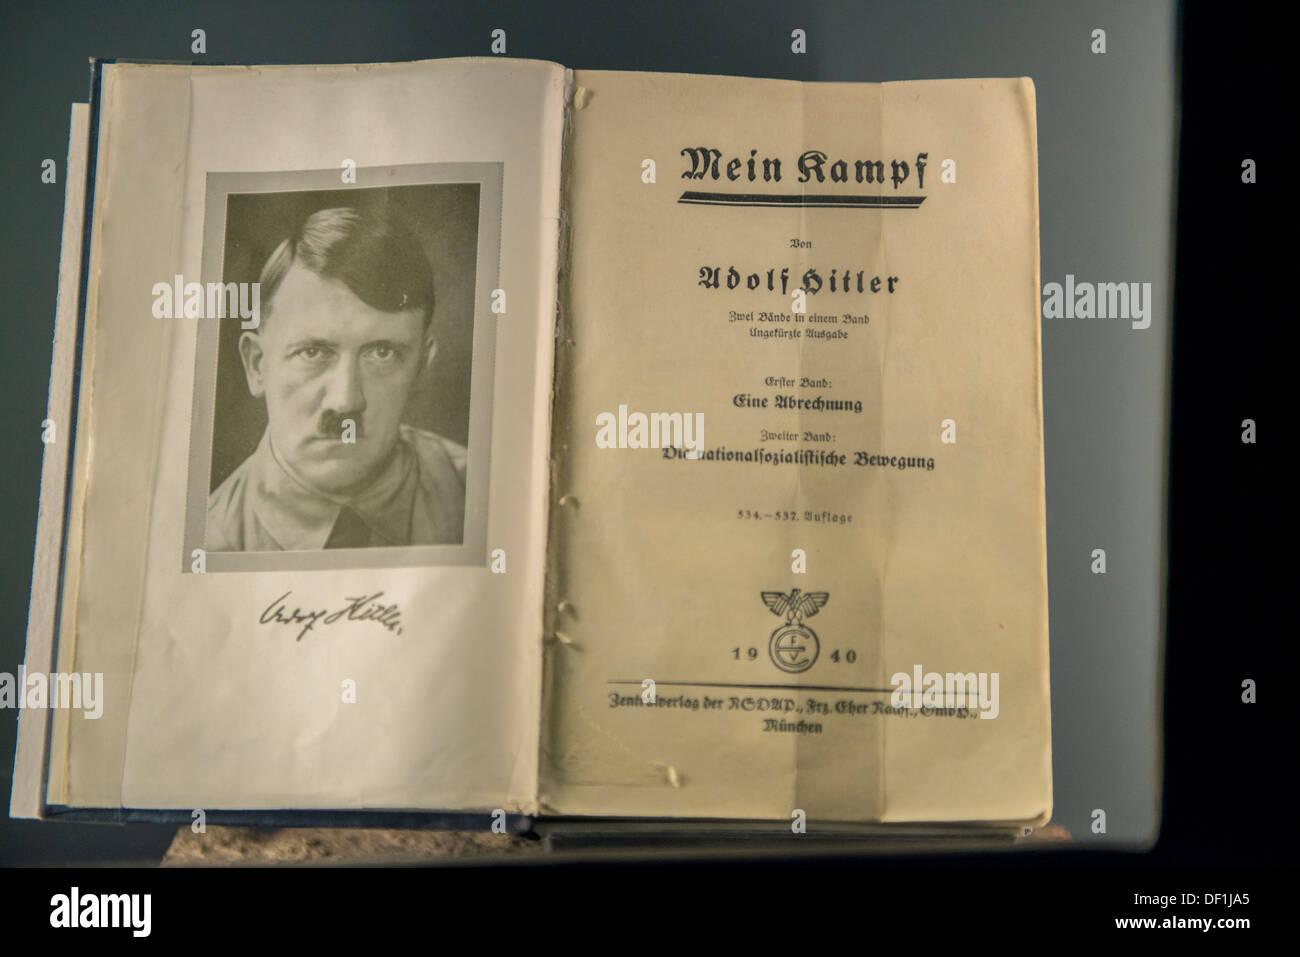 Mein Kampf on display at Documentation Centre, Nuremberg, Germany - Stock Image